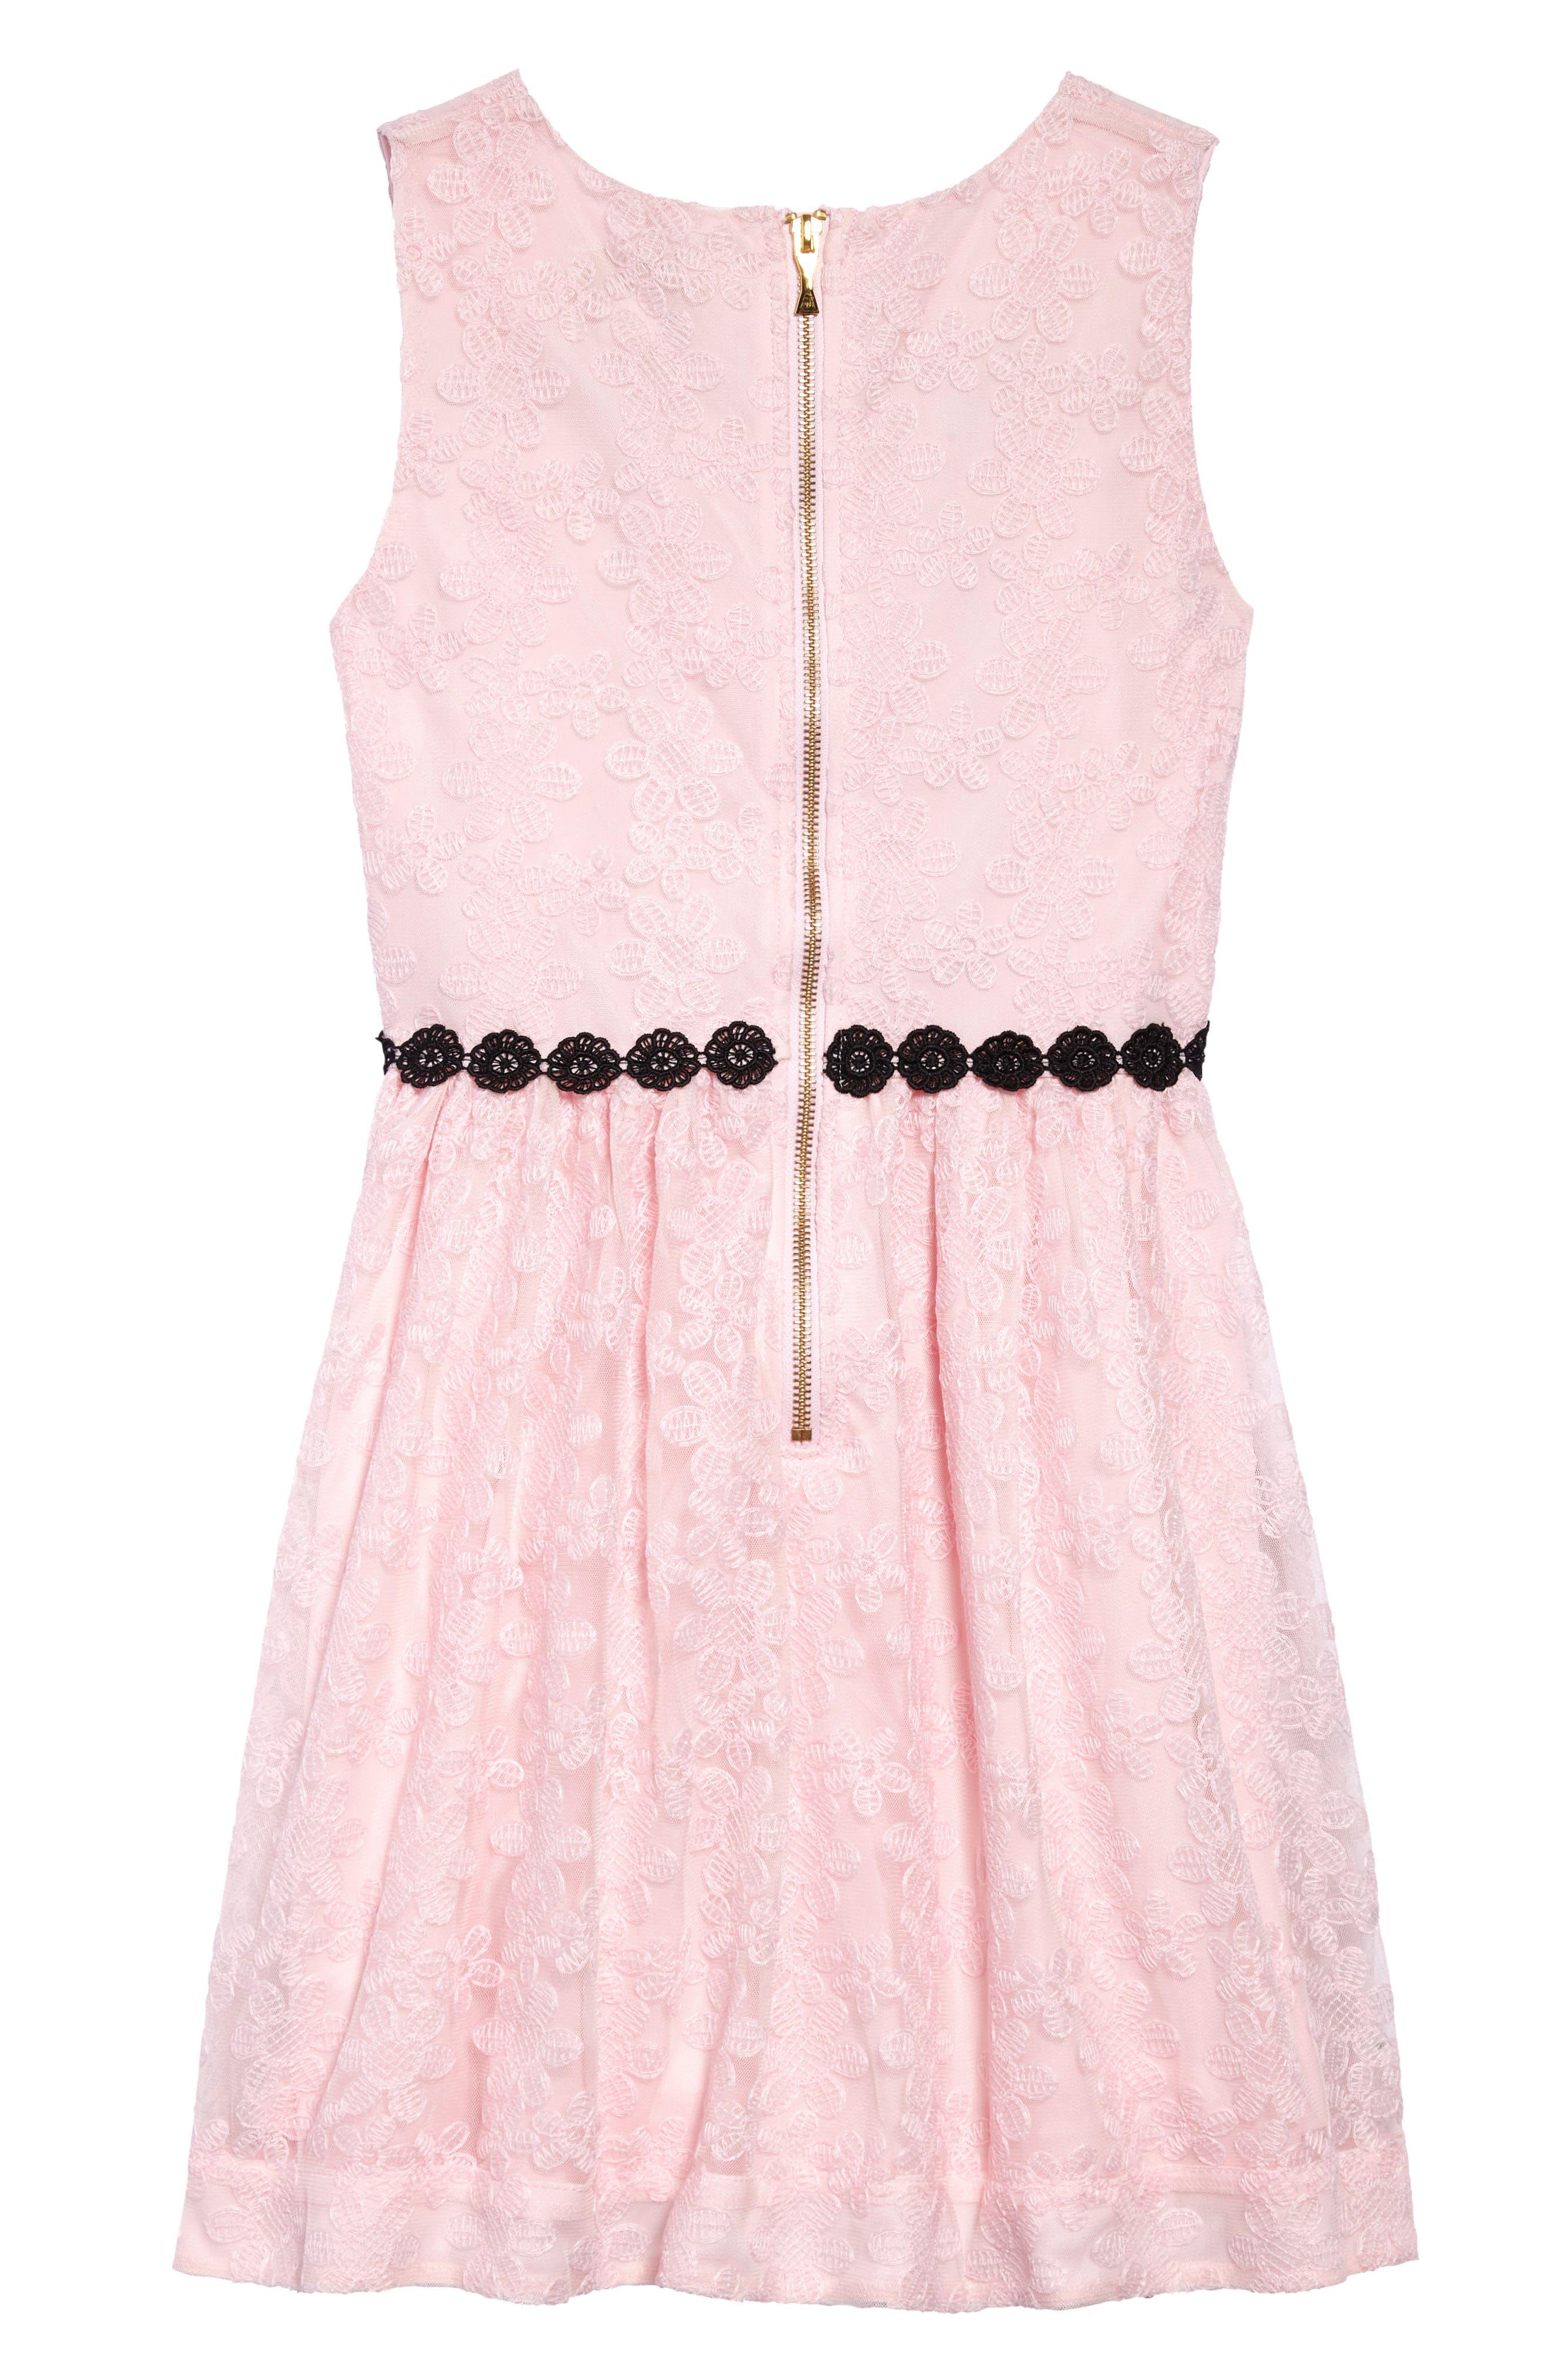 floral mesh sleeveless dress,                             Alternate thumbnail 2, color,                             Sonata Pink